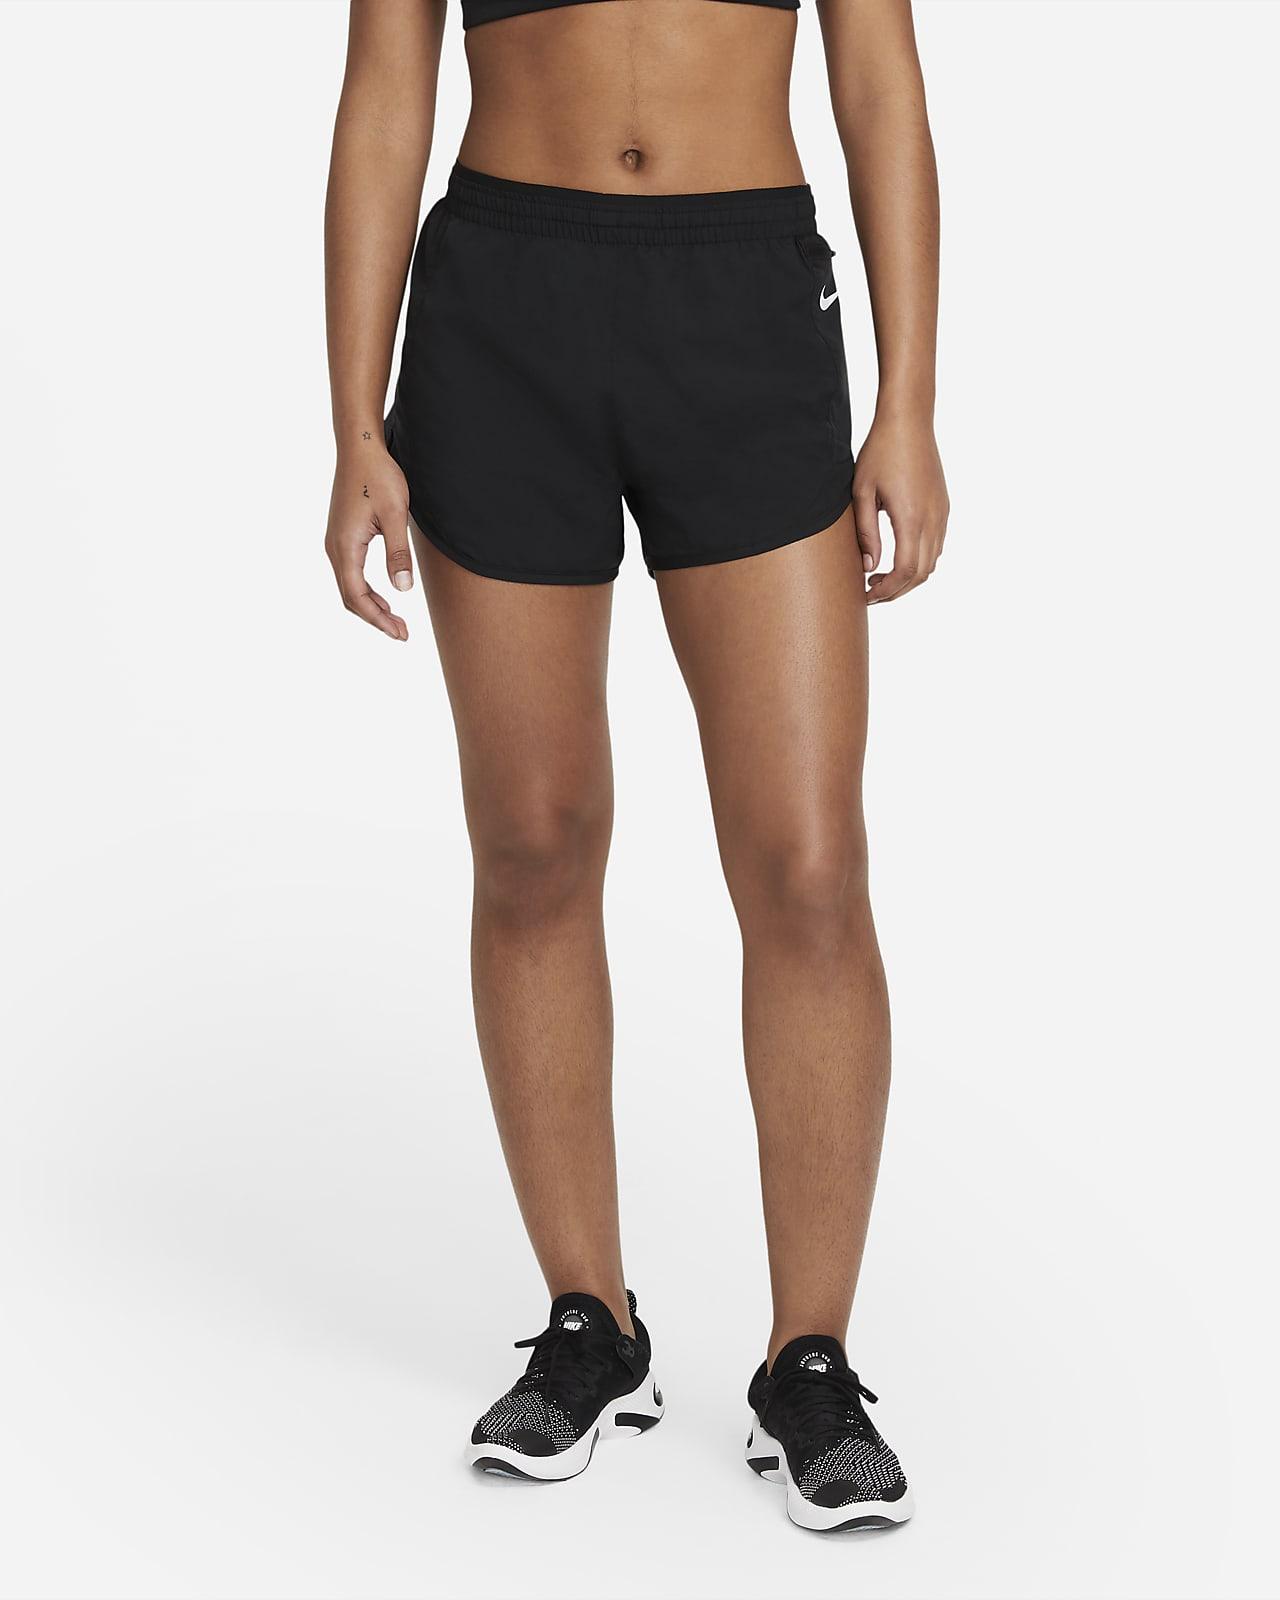 Short de running 8 cm Nike Tempo Luxe pour Femme